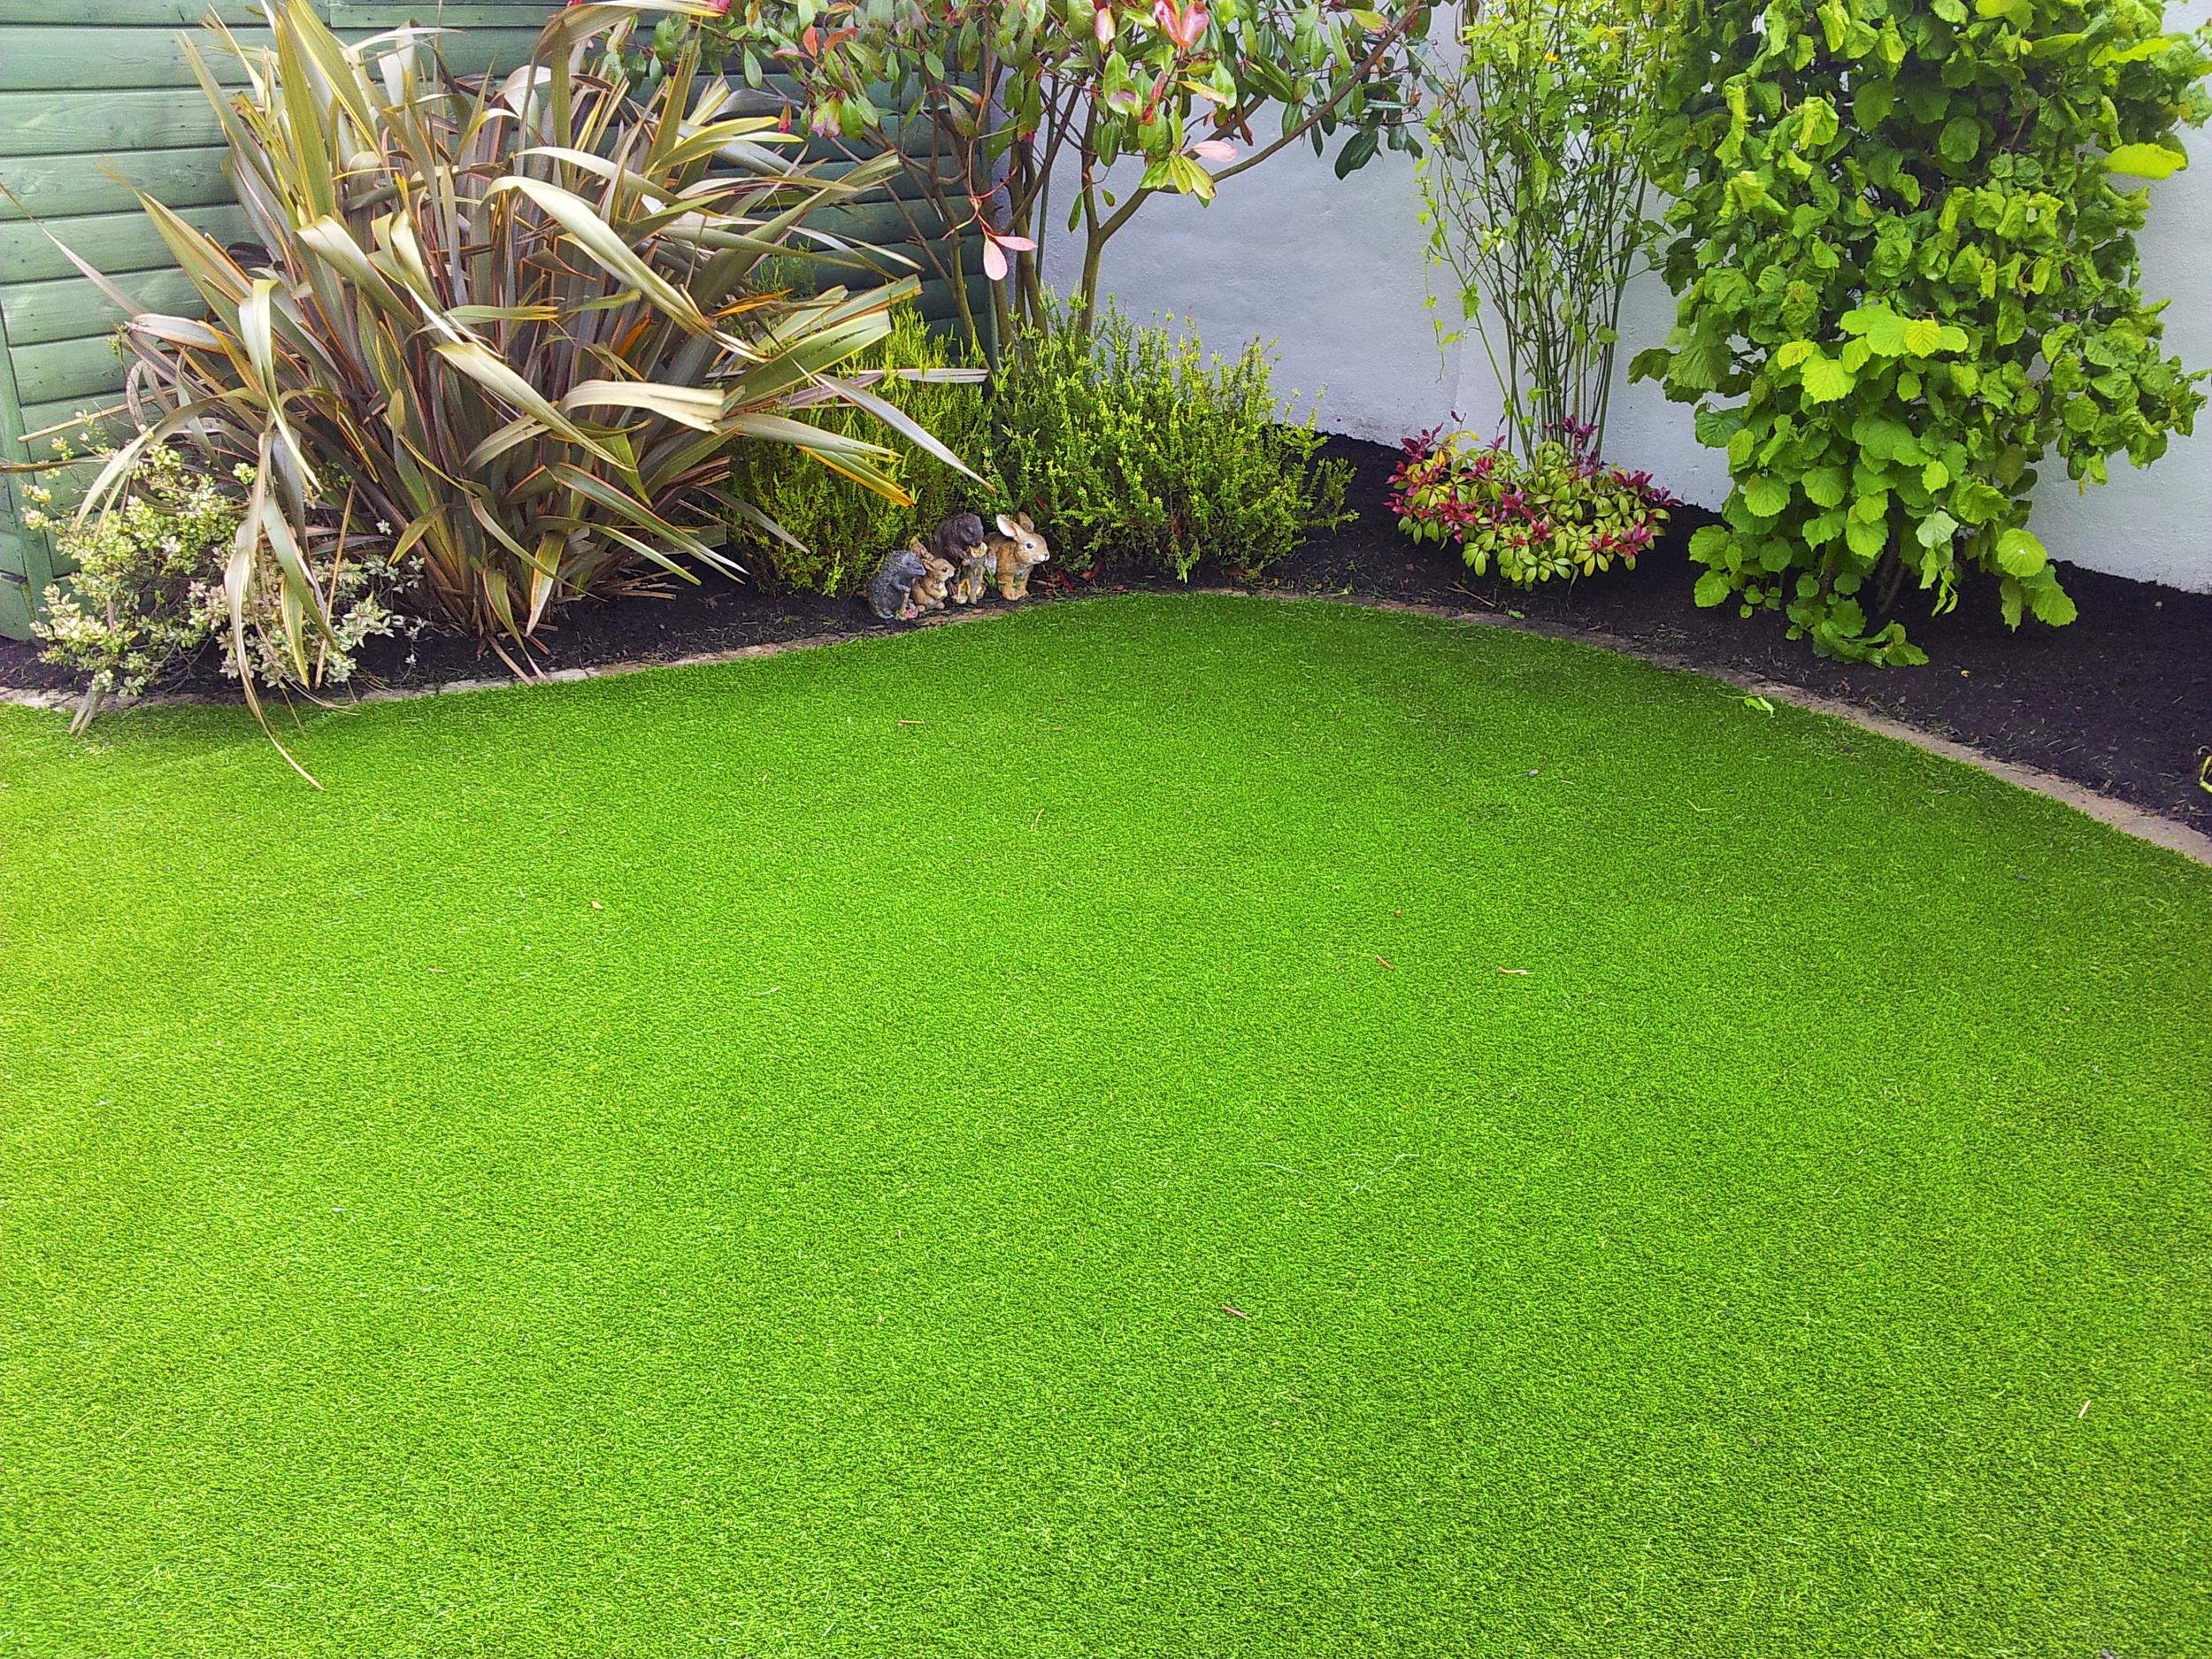 TigerTurf lawn transformation